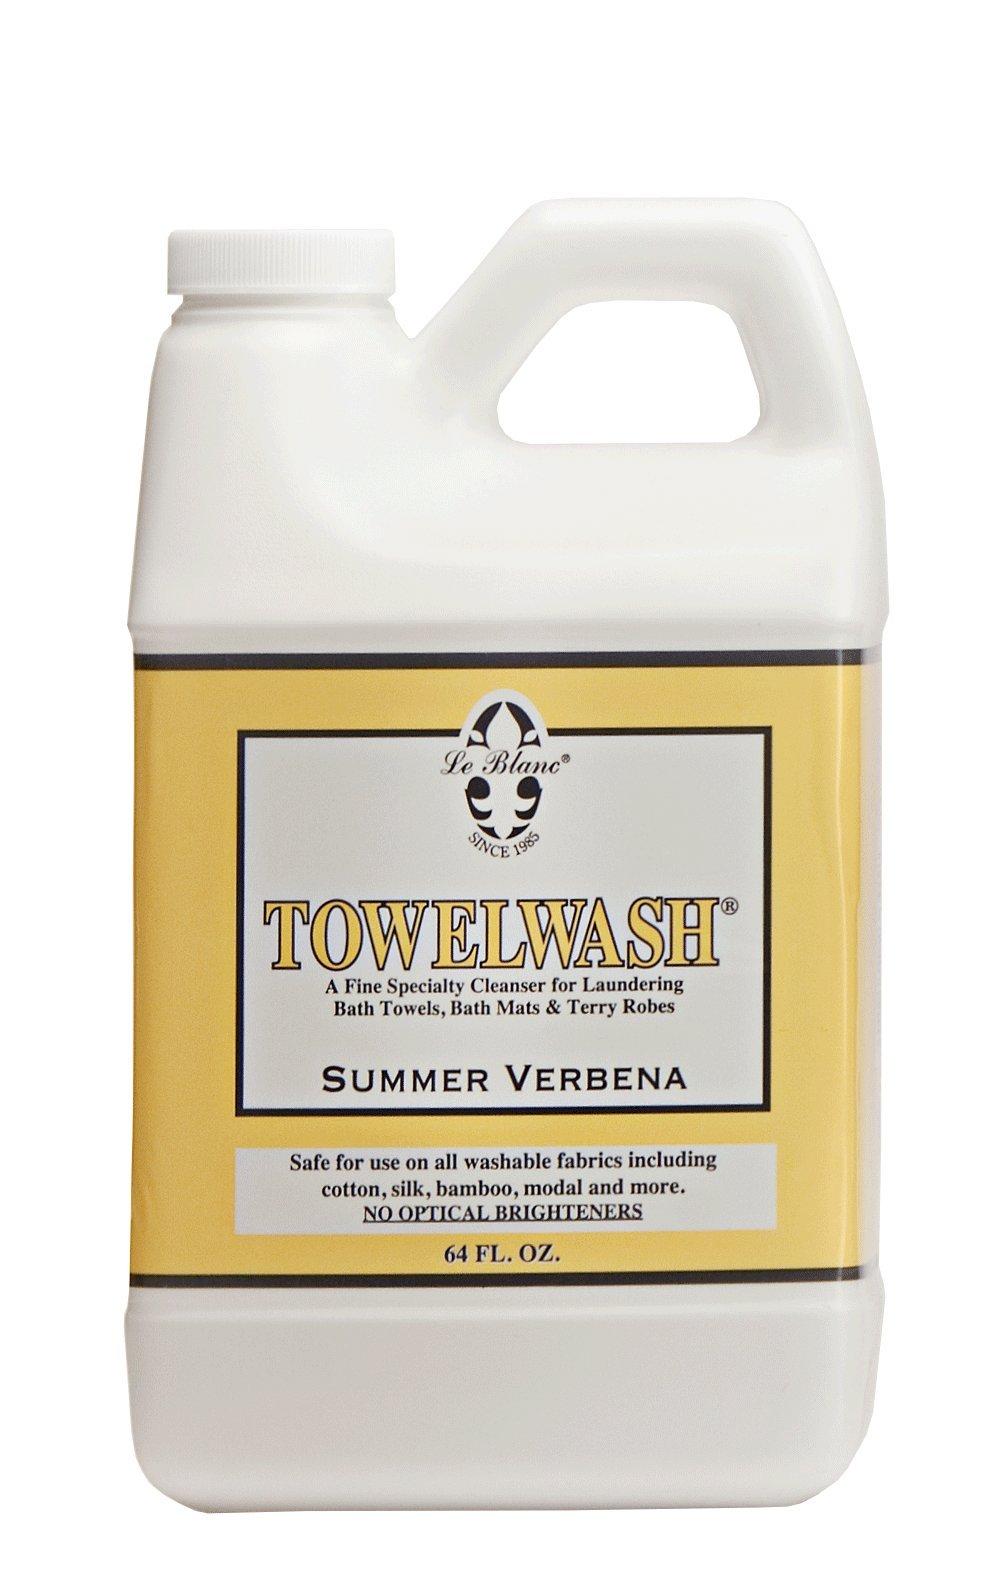 Le Blanc® Summer Verbena Towelwash® - 64 FL. OZ., 3 pack